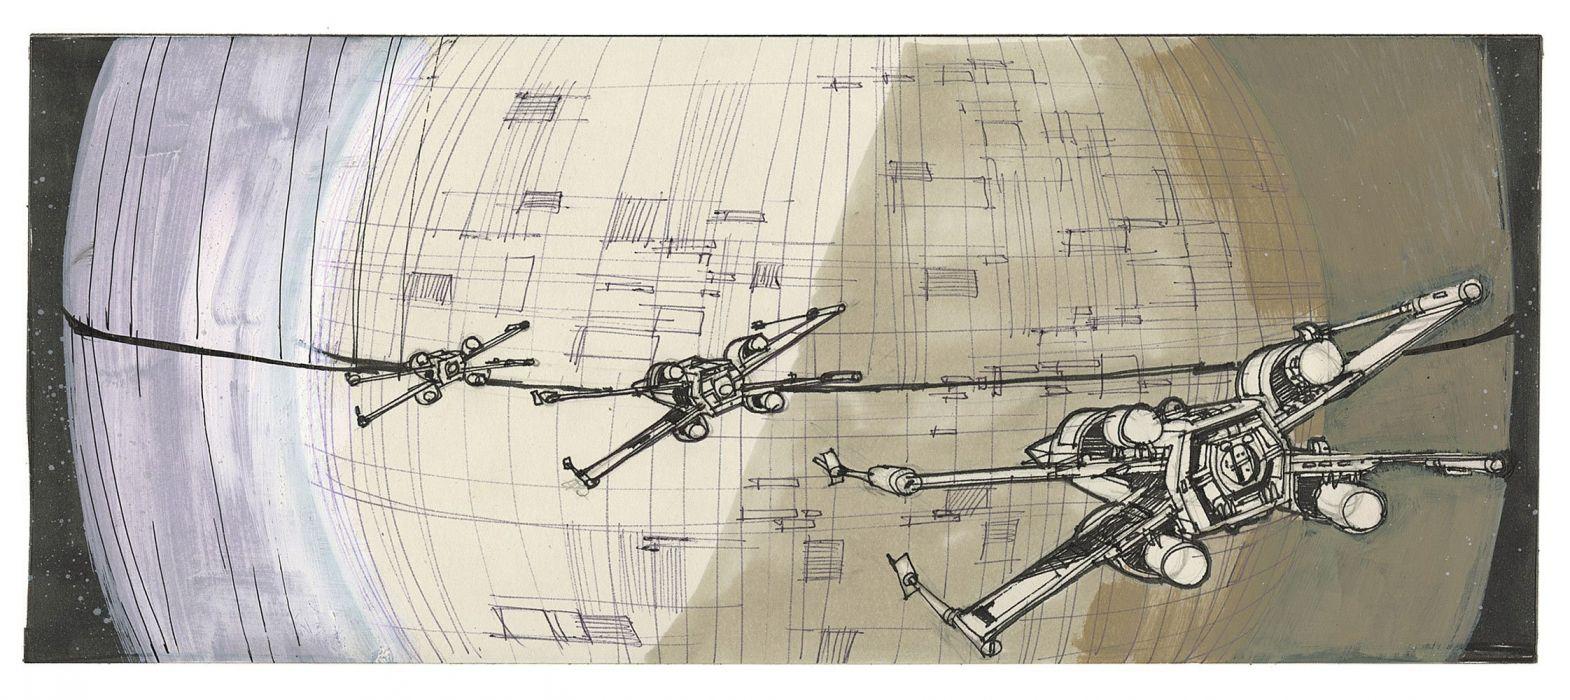 STAR WARS sci-fi action fighting futuristic series adventure disney wallpaper